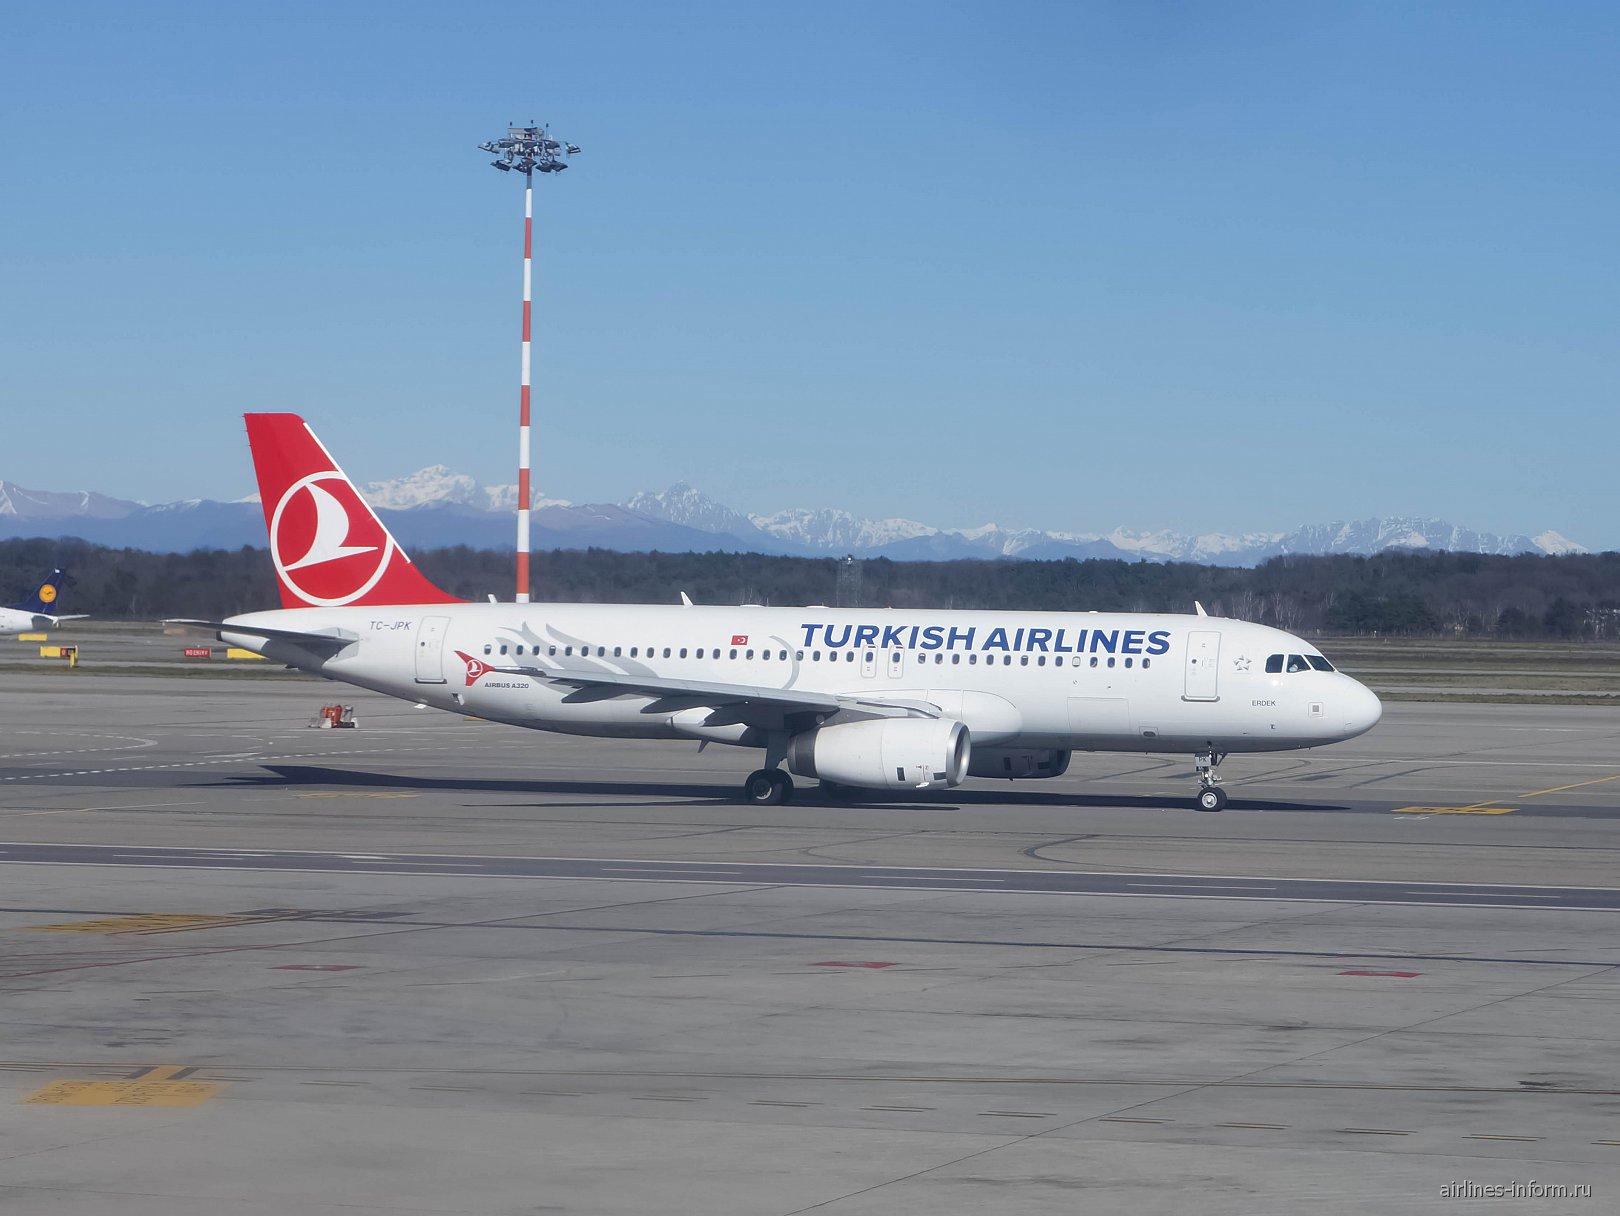 Airbus A320 Турецких авиалиний в аэропорту Милан Мальпенса